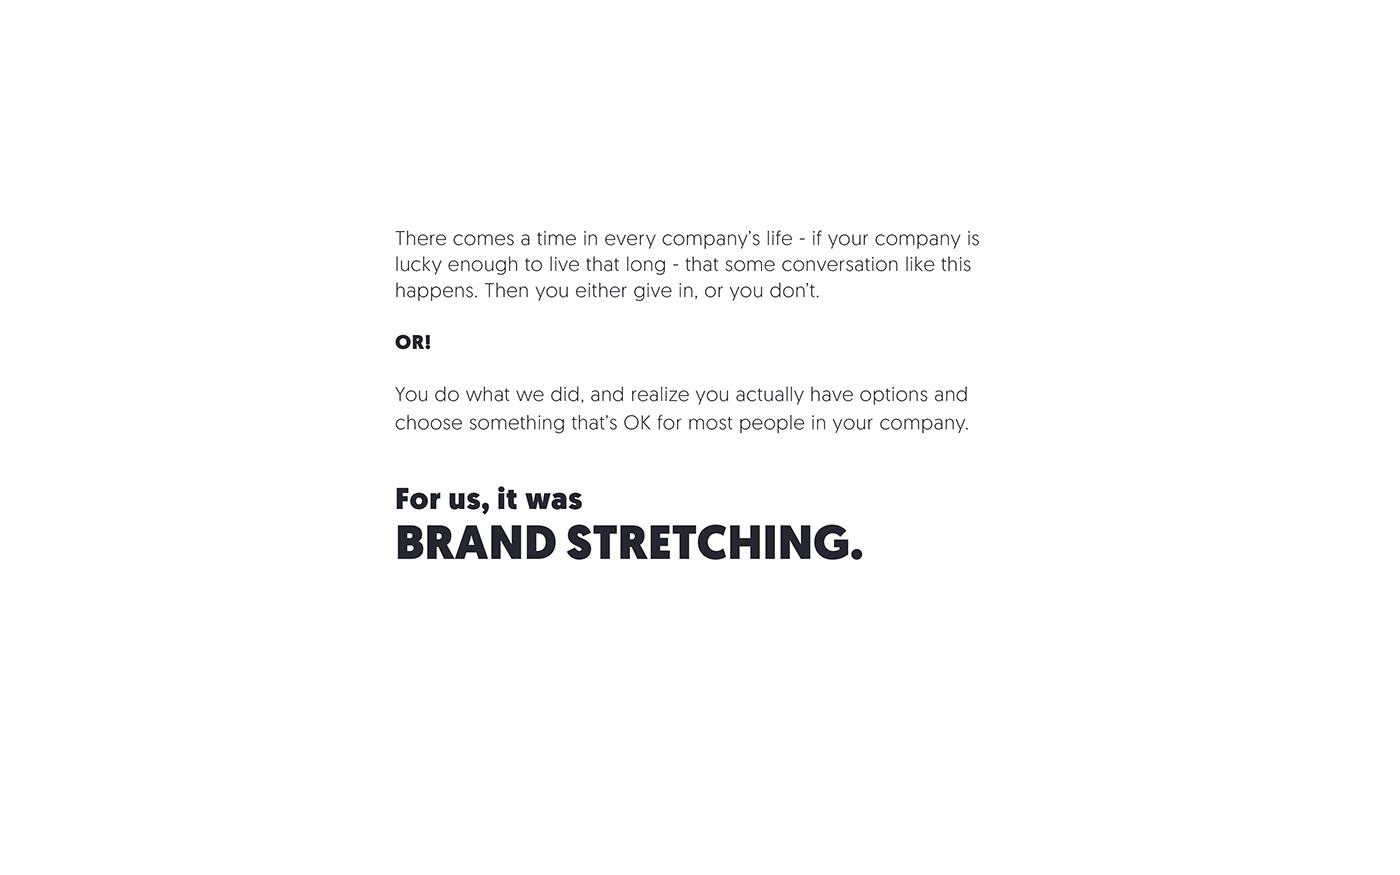 branding  art direction  ILLUSTRATION  rebranding graphic design  copywriting  Case Study brand stretching